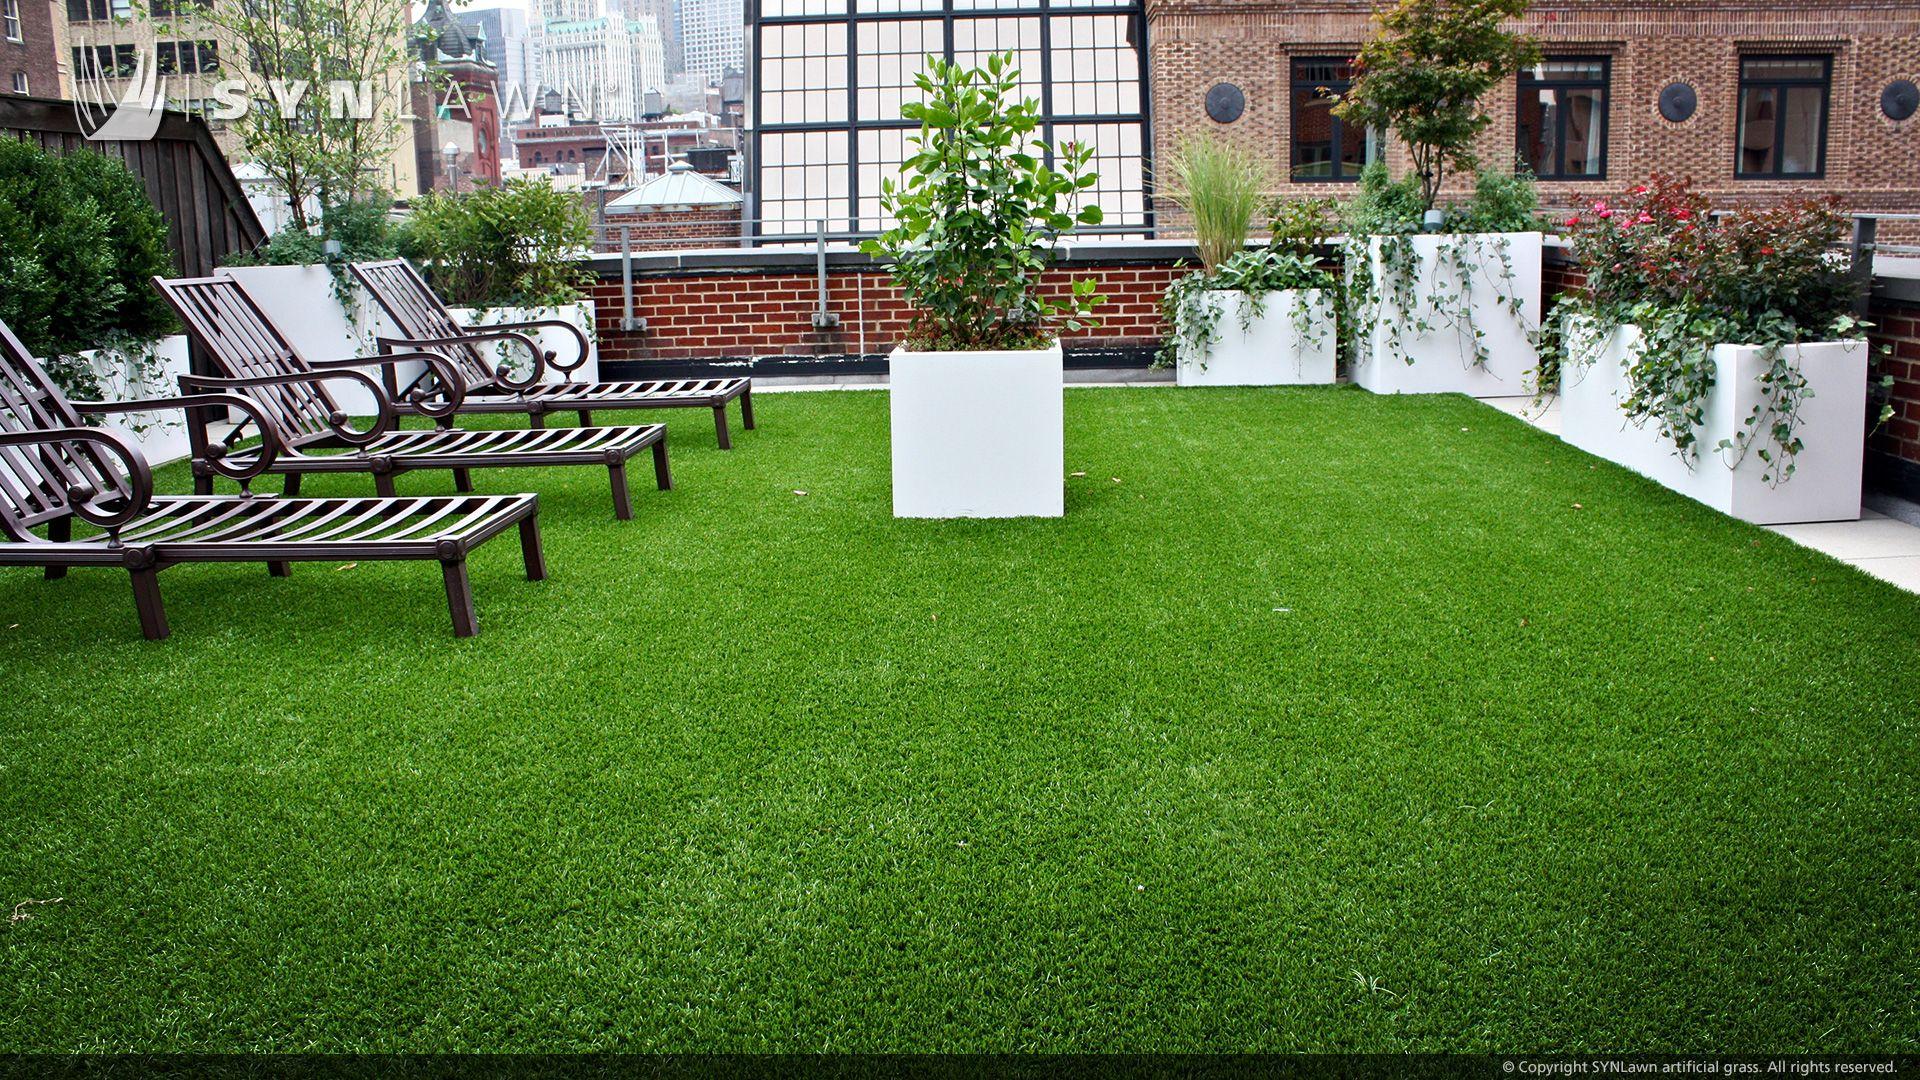 rooftop s new standard roof decks roof deck astro. Black Bedroom Furniture Sets. Home Design Ideas